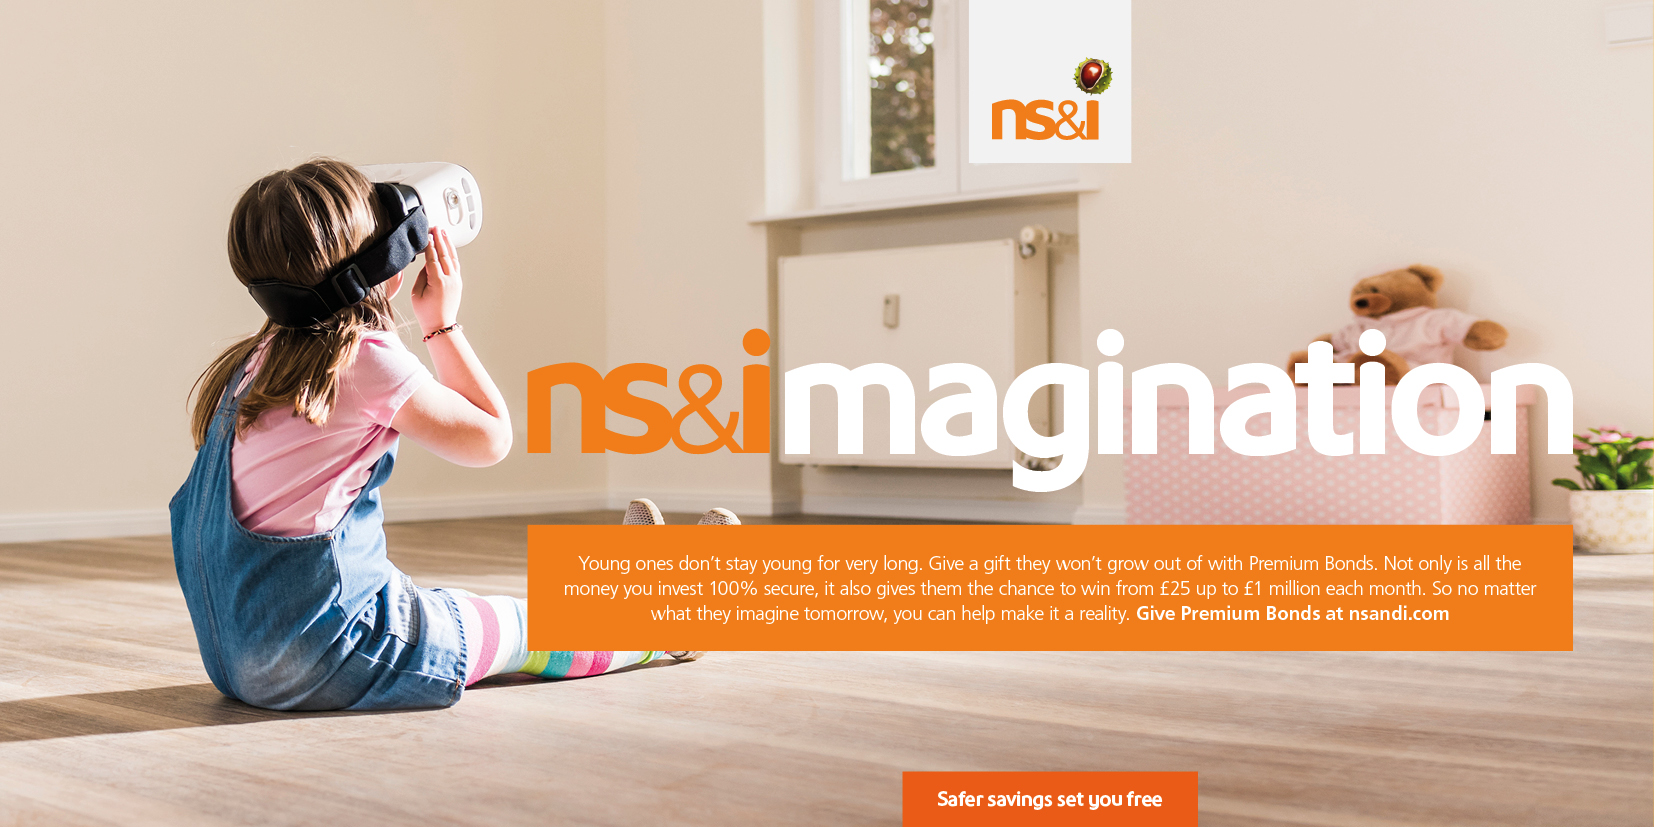 NS&I_Route1_Layout_Imagination2.jpg